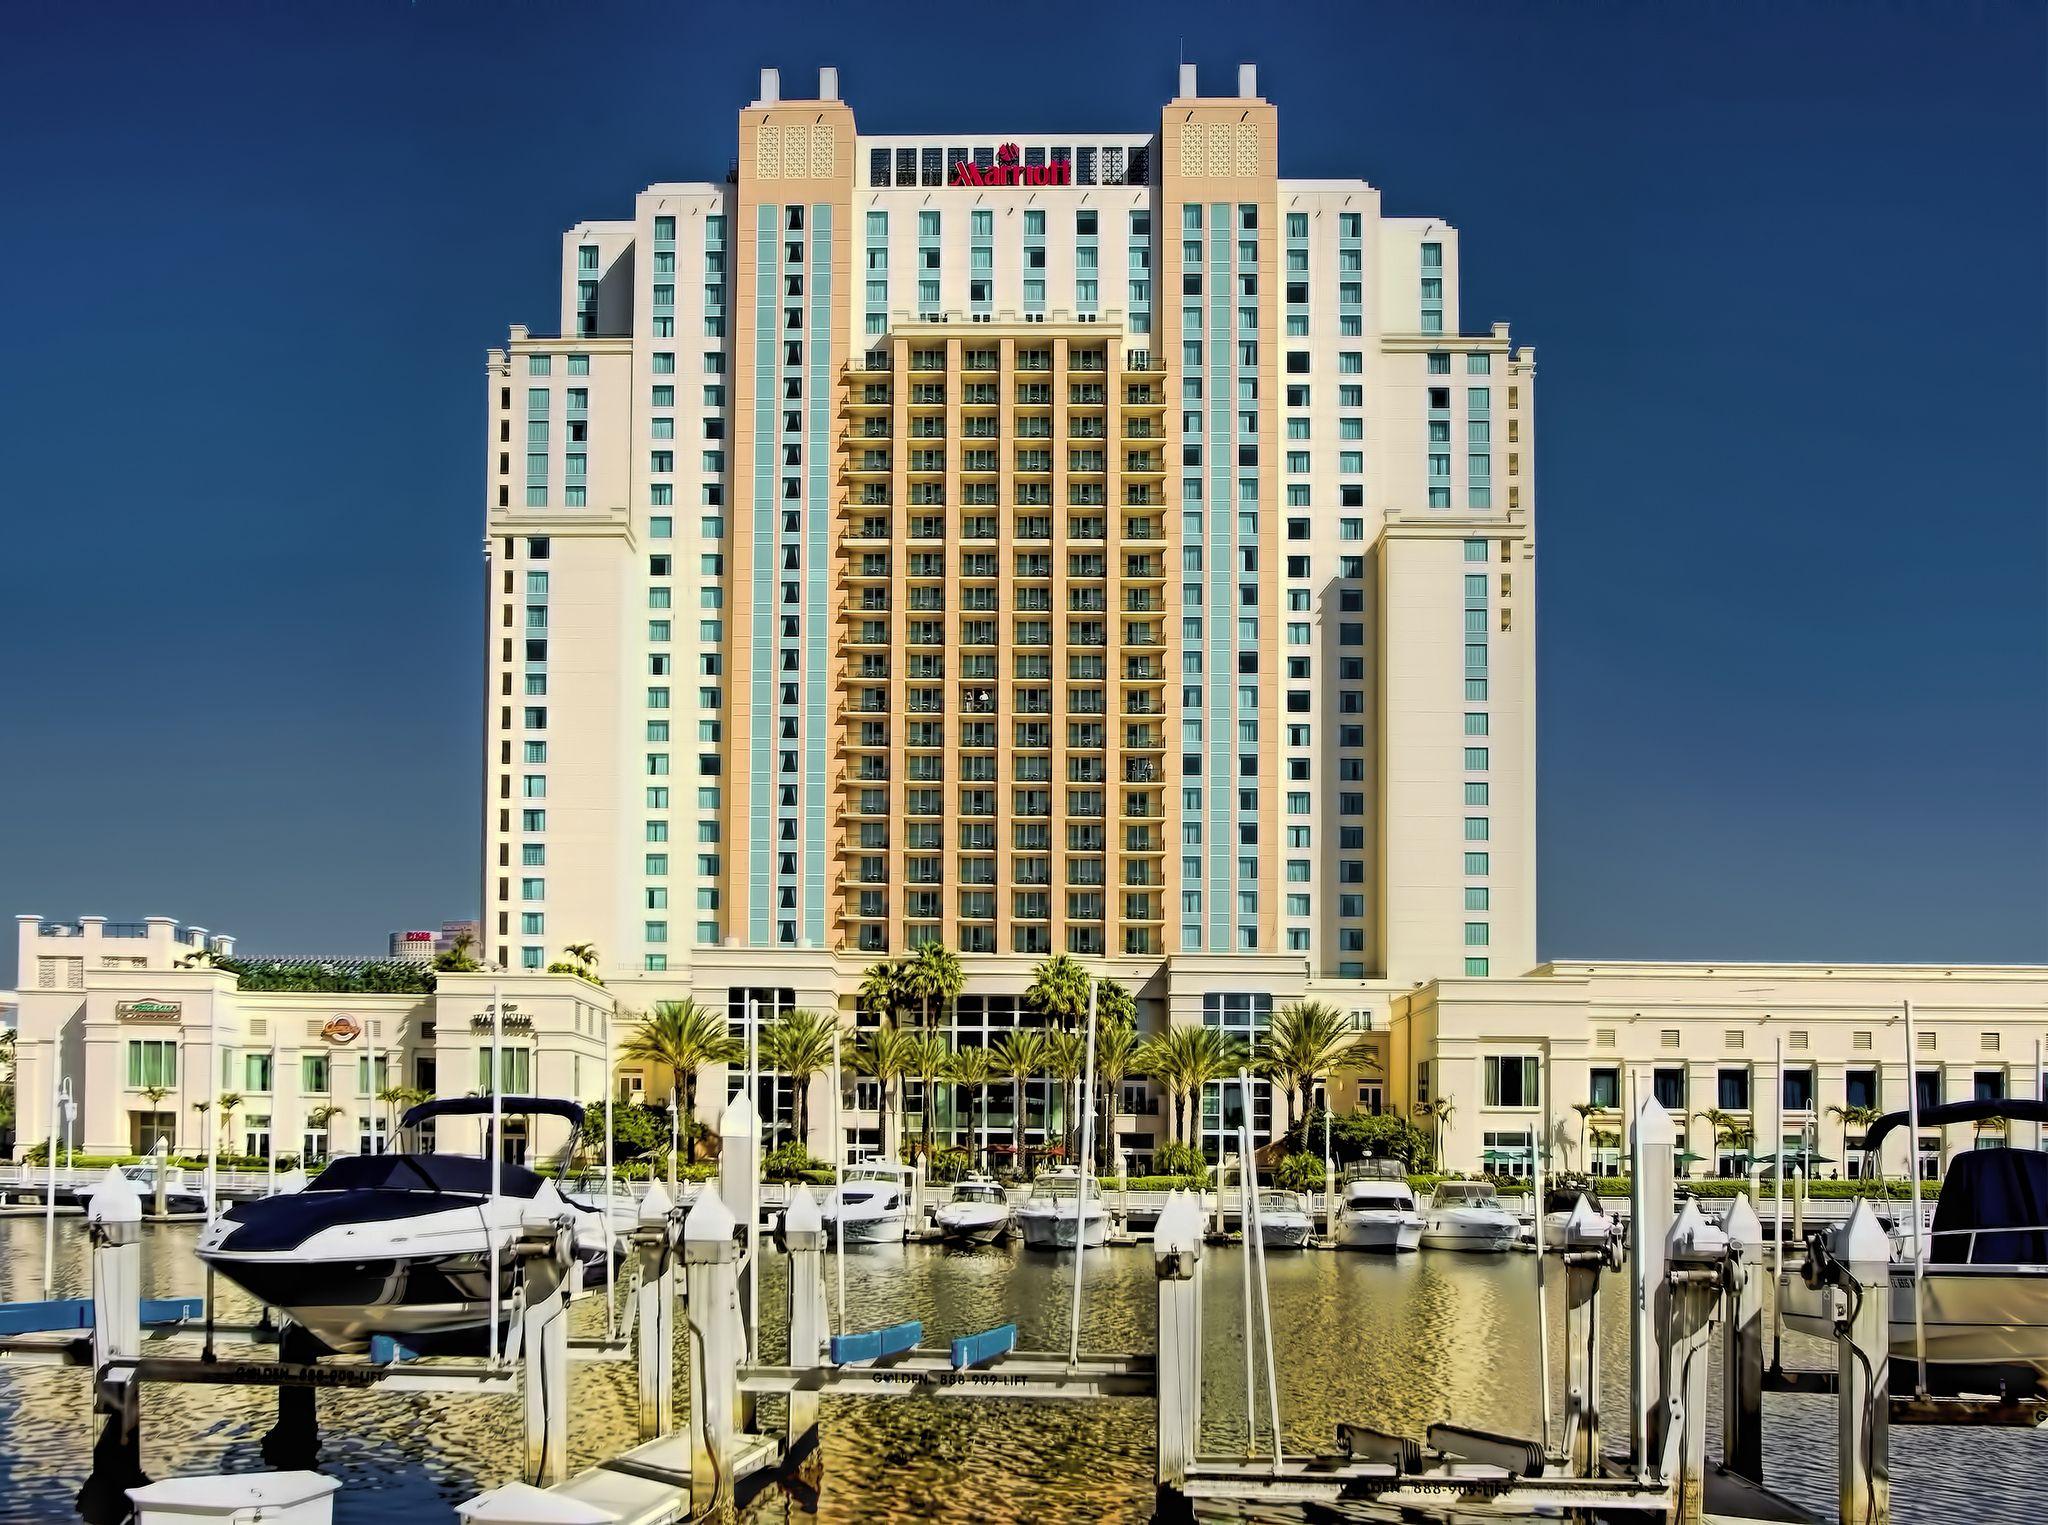 1568ec603227bf01c96dfd336e1d1a68 - Embassy Suites Tampa Fl Busch Gardens